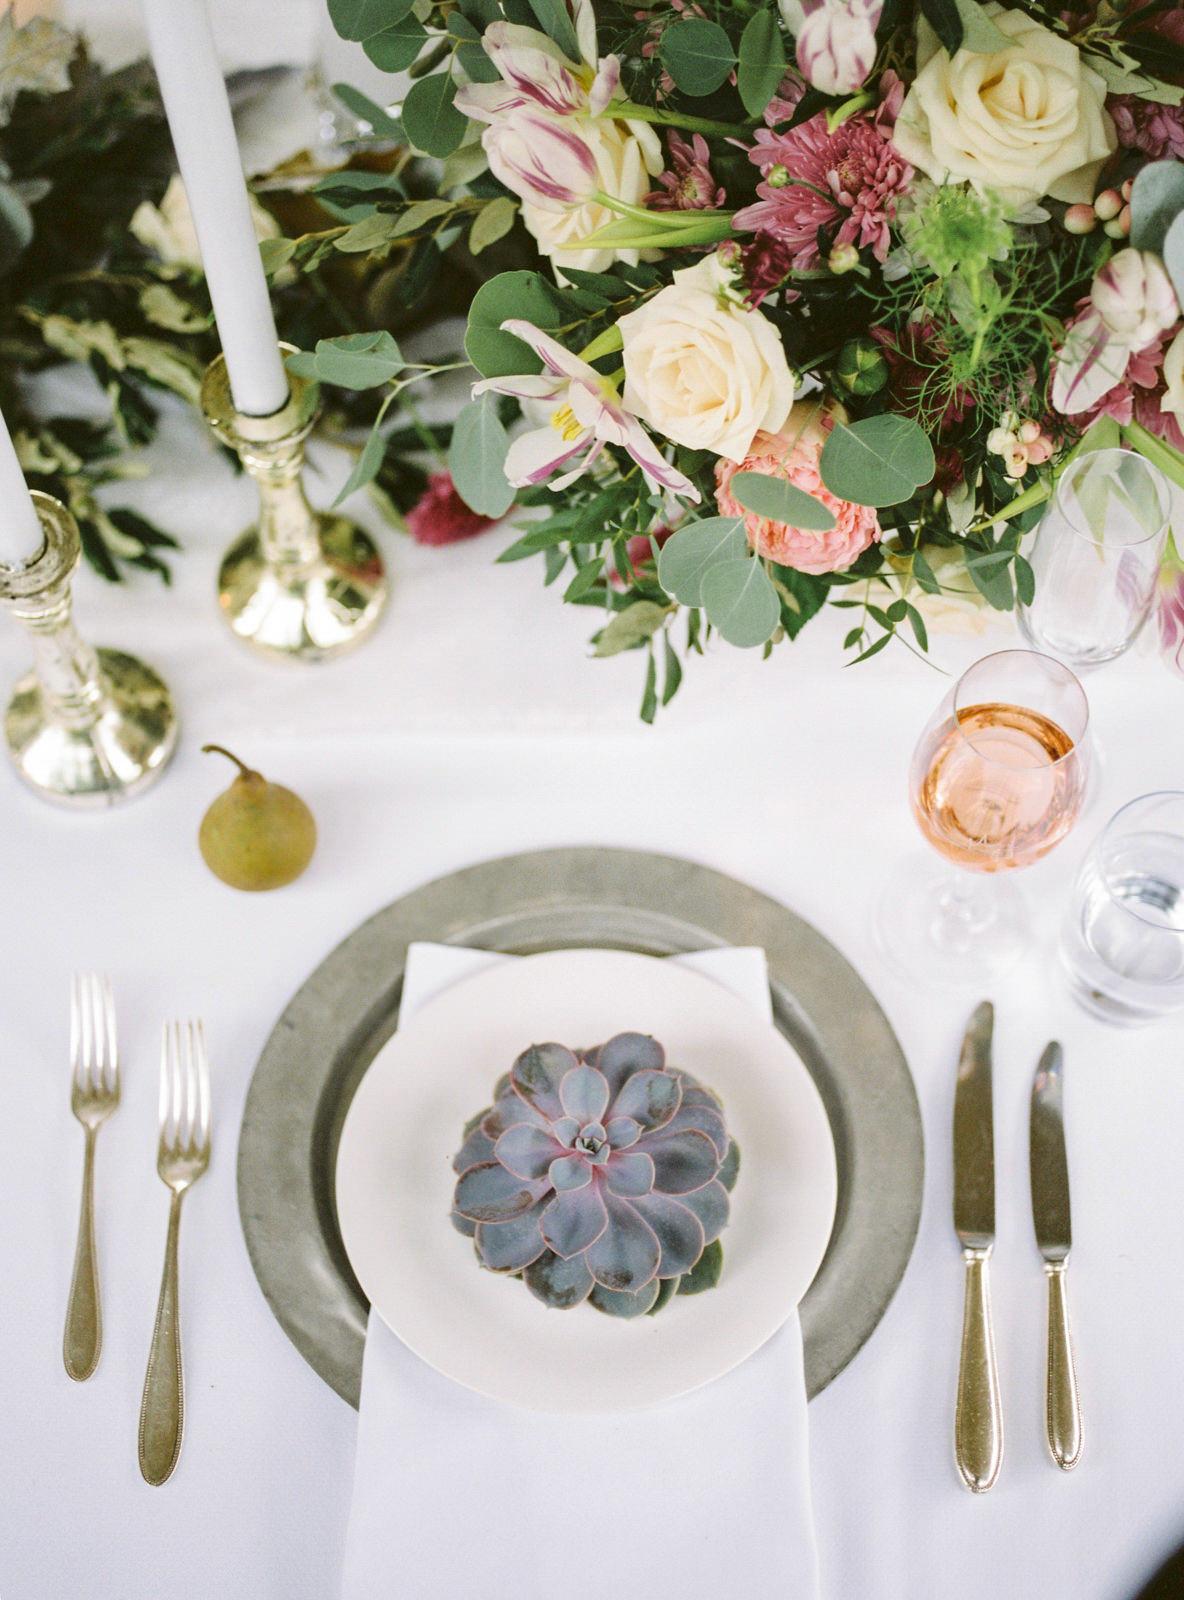 Branding Shoot Photo Idea for Florist Floral Designer